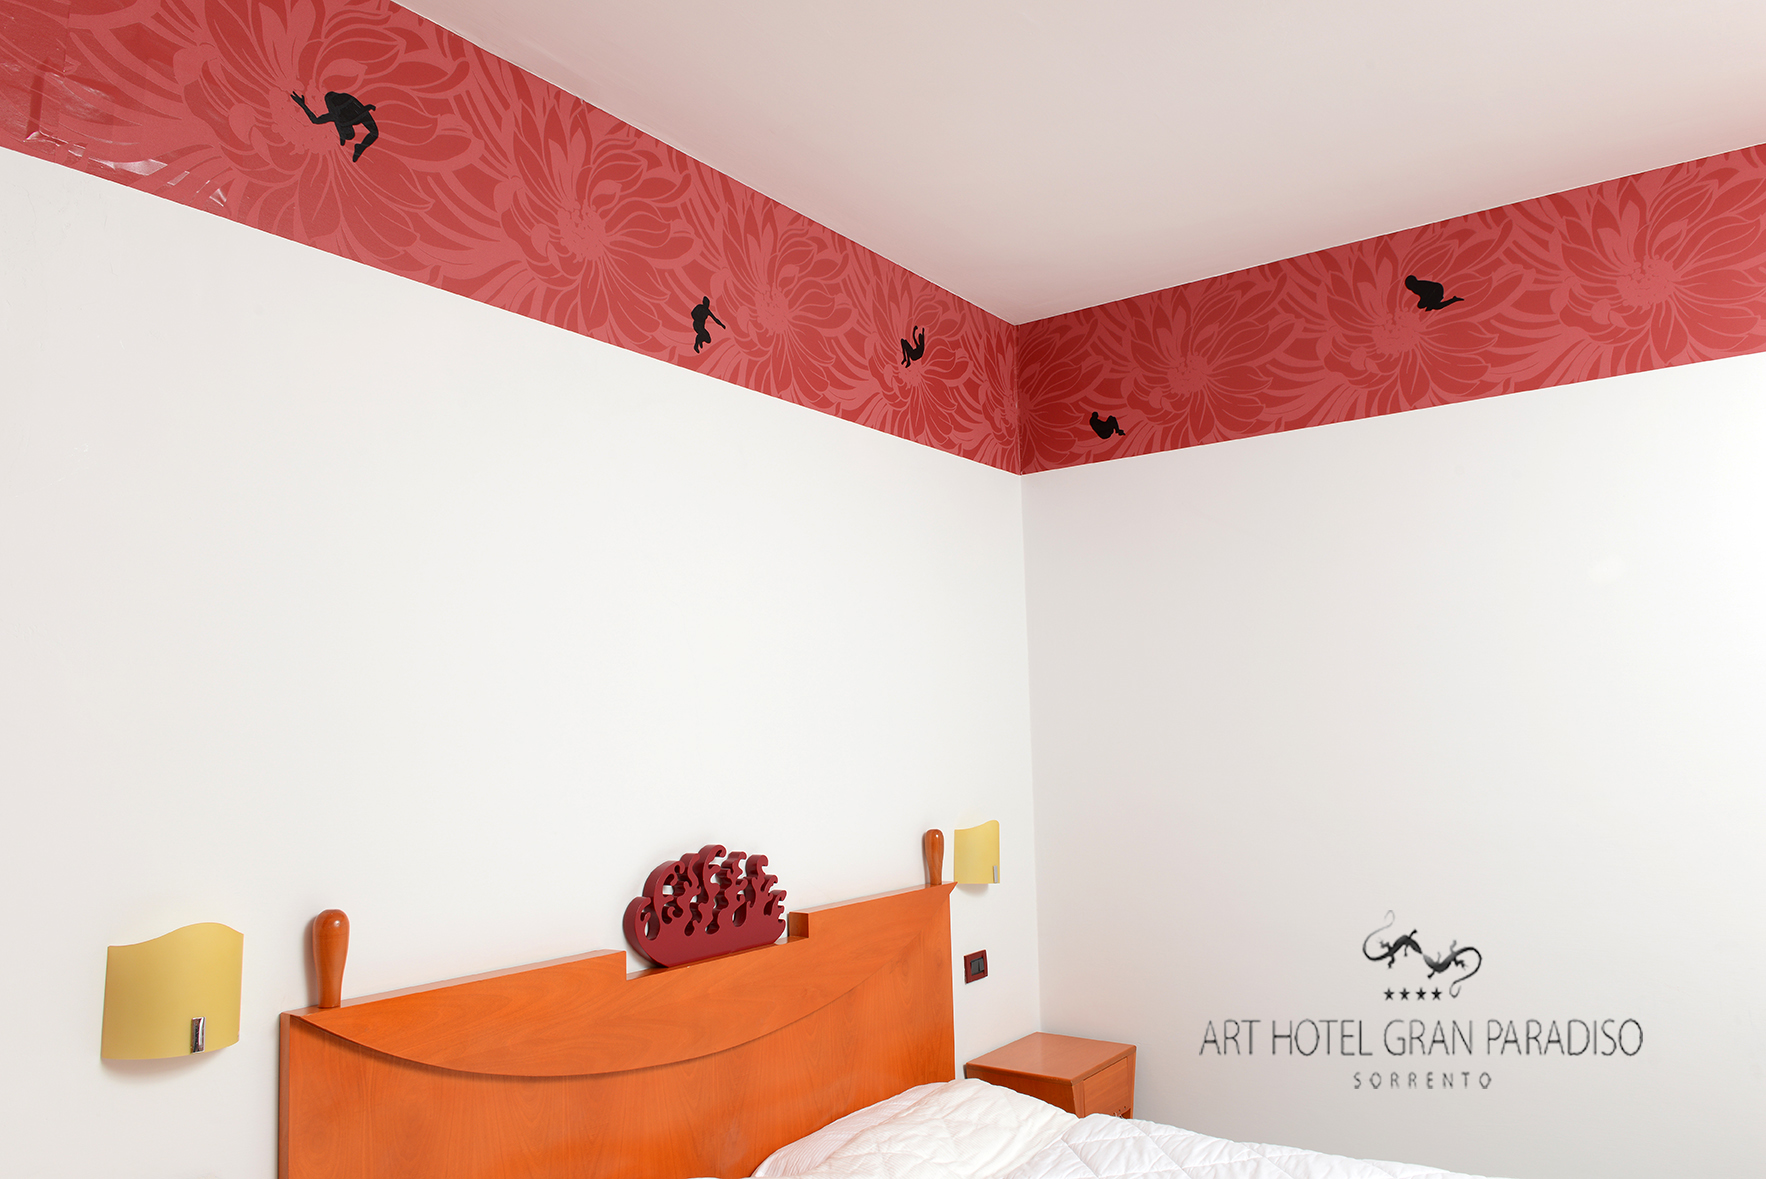 Art_Hotel_Gran_Paradiso_2013_311_Donatella_Spaziani_7.jpg